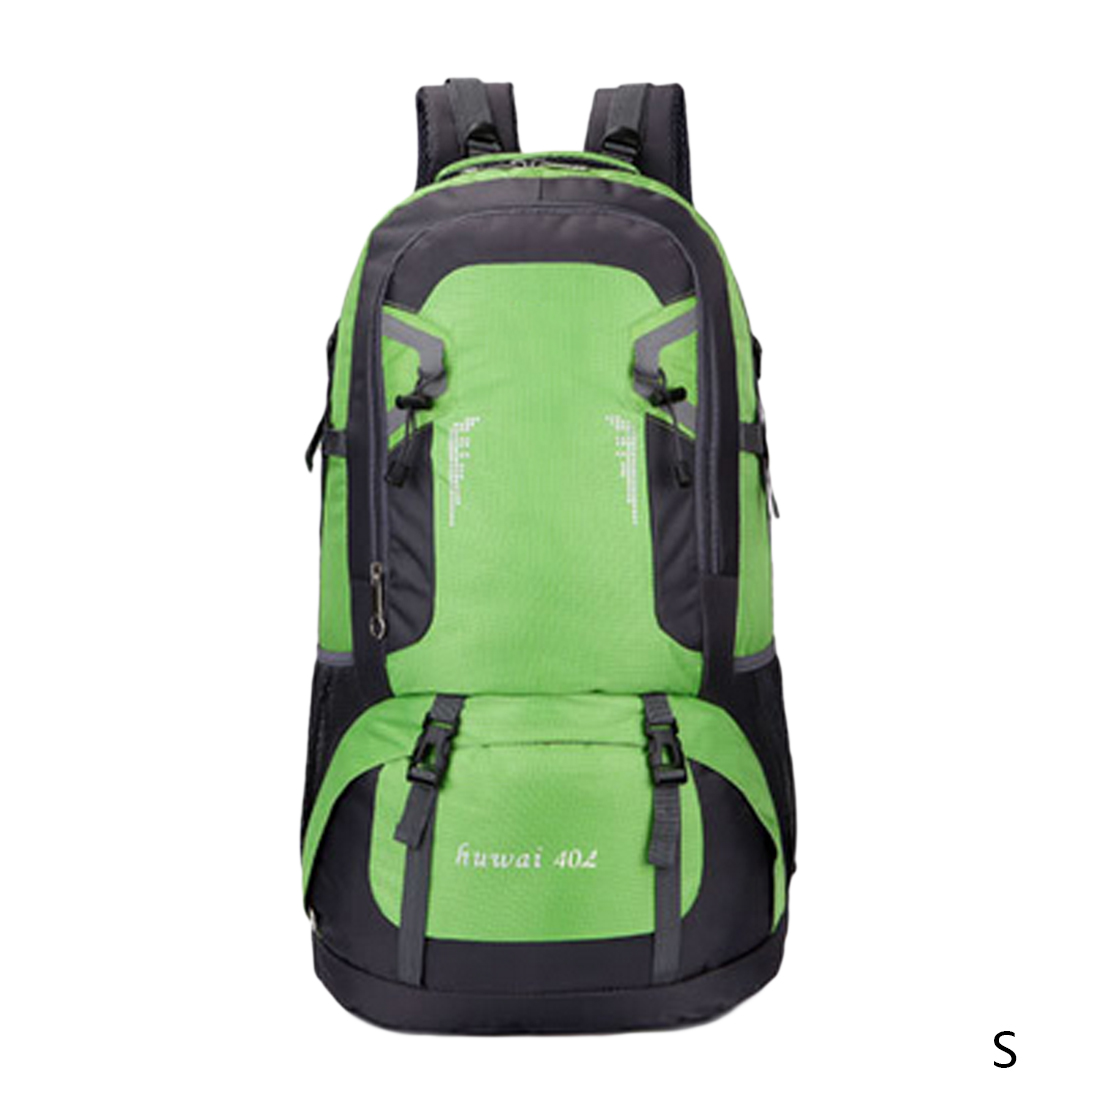 Men Backpack Women Climbing Sport Bag Outdoor Travel Backpacks Waterproof Hiking Camping Rucksack Nylon Computer Bags цена